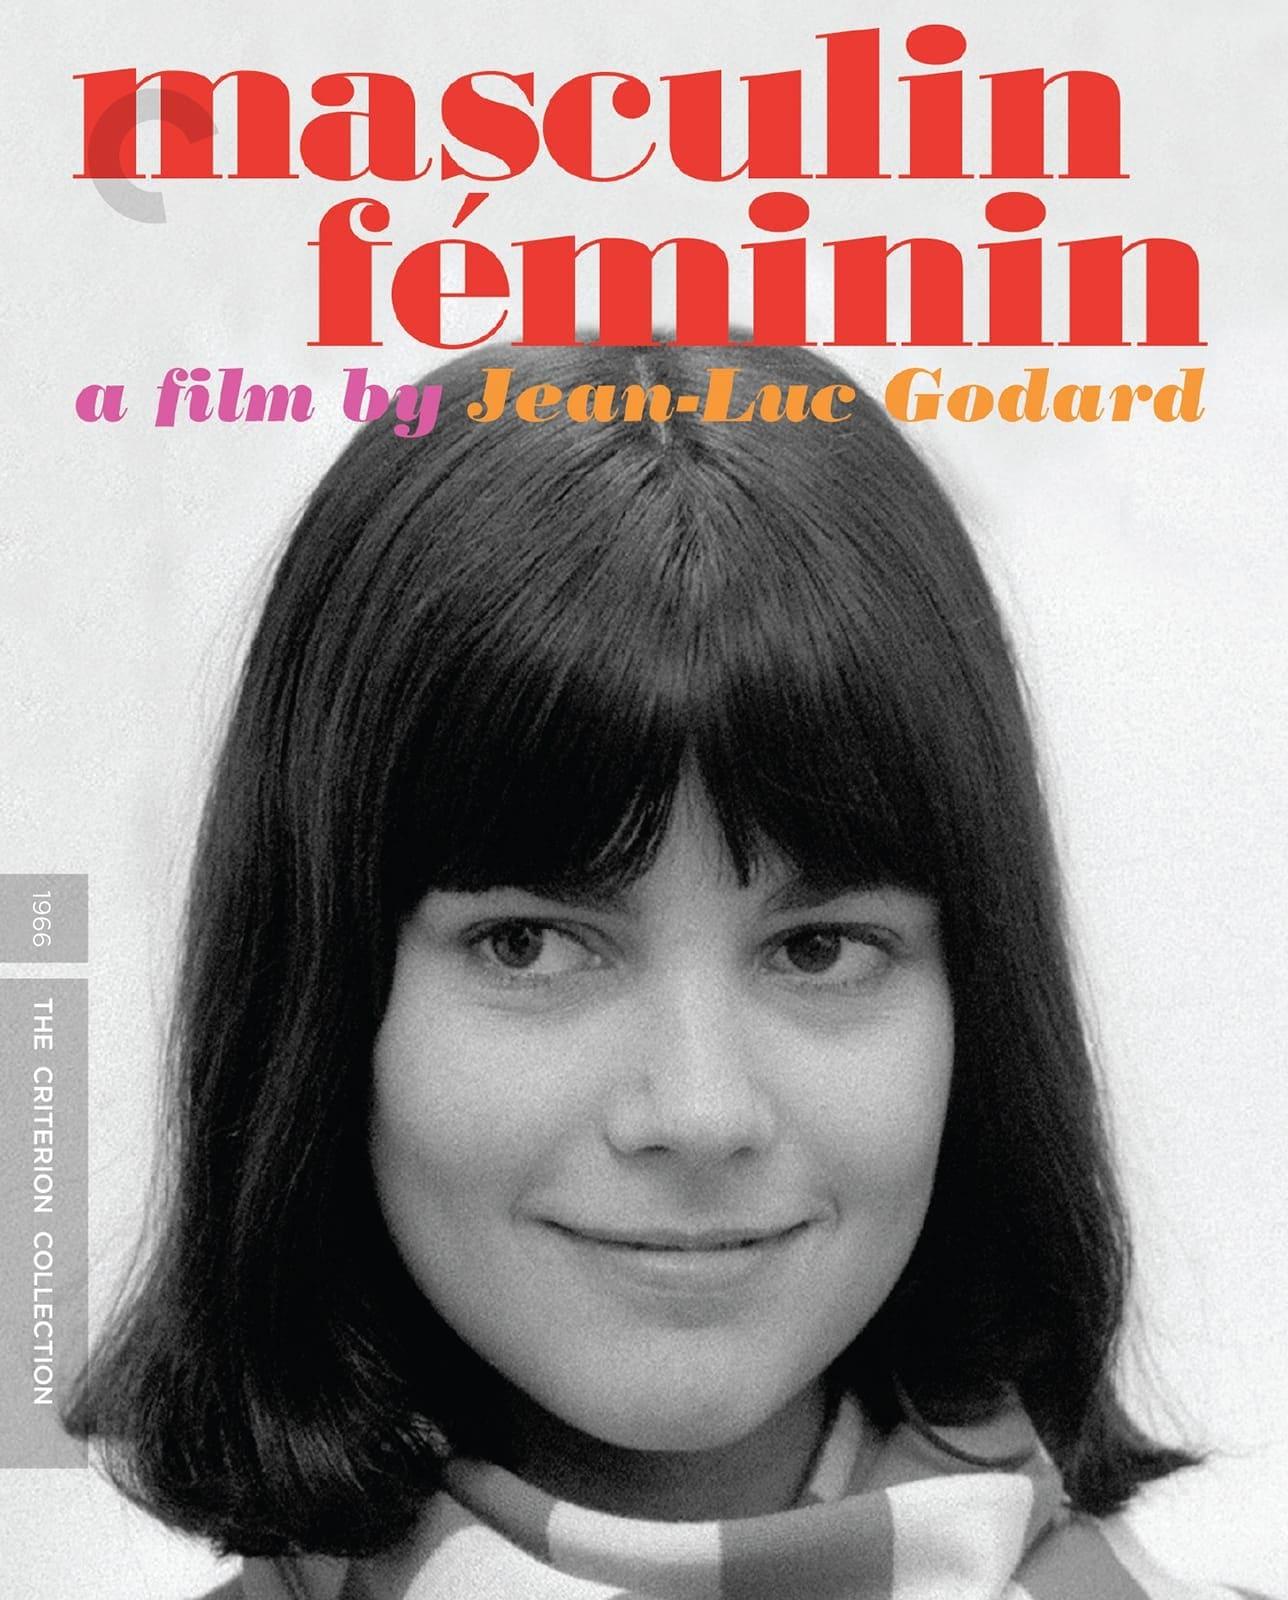 Masculin Feminin The Criterion Collection Bluray